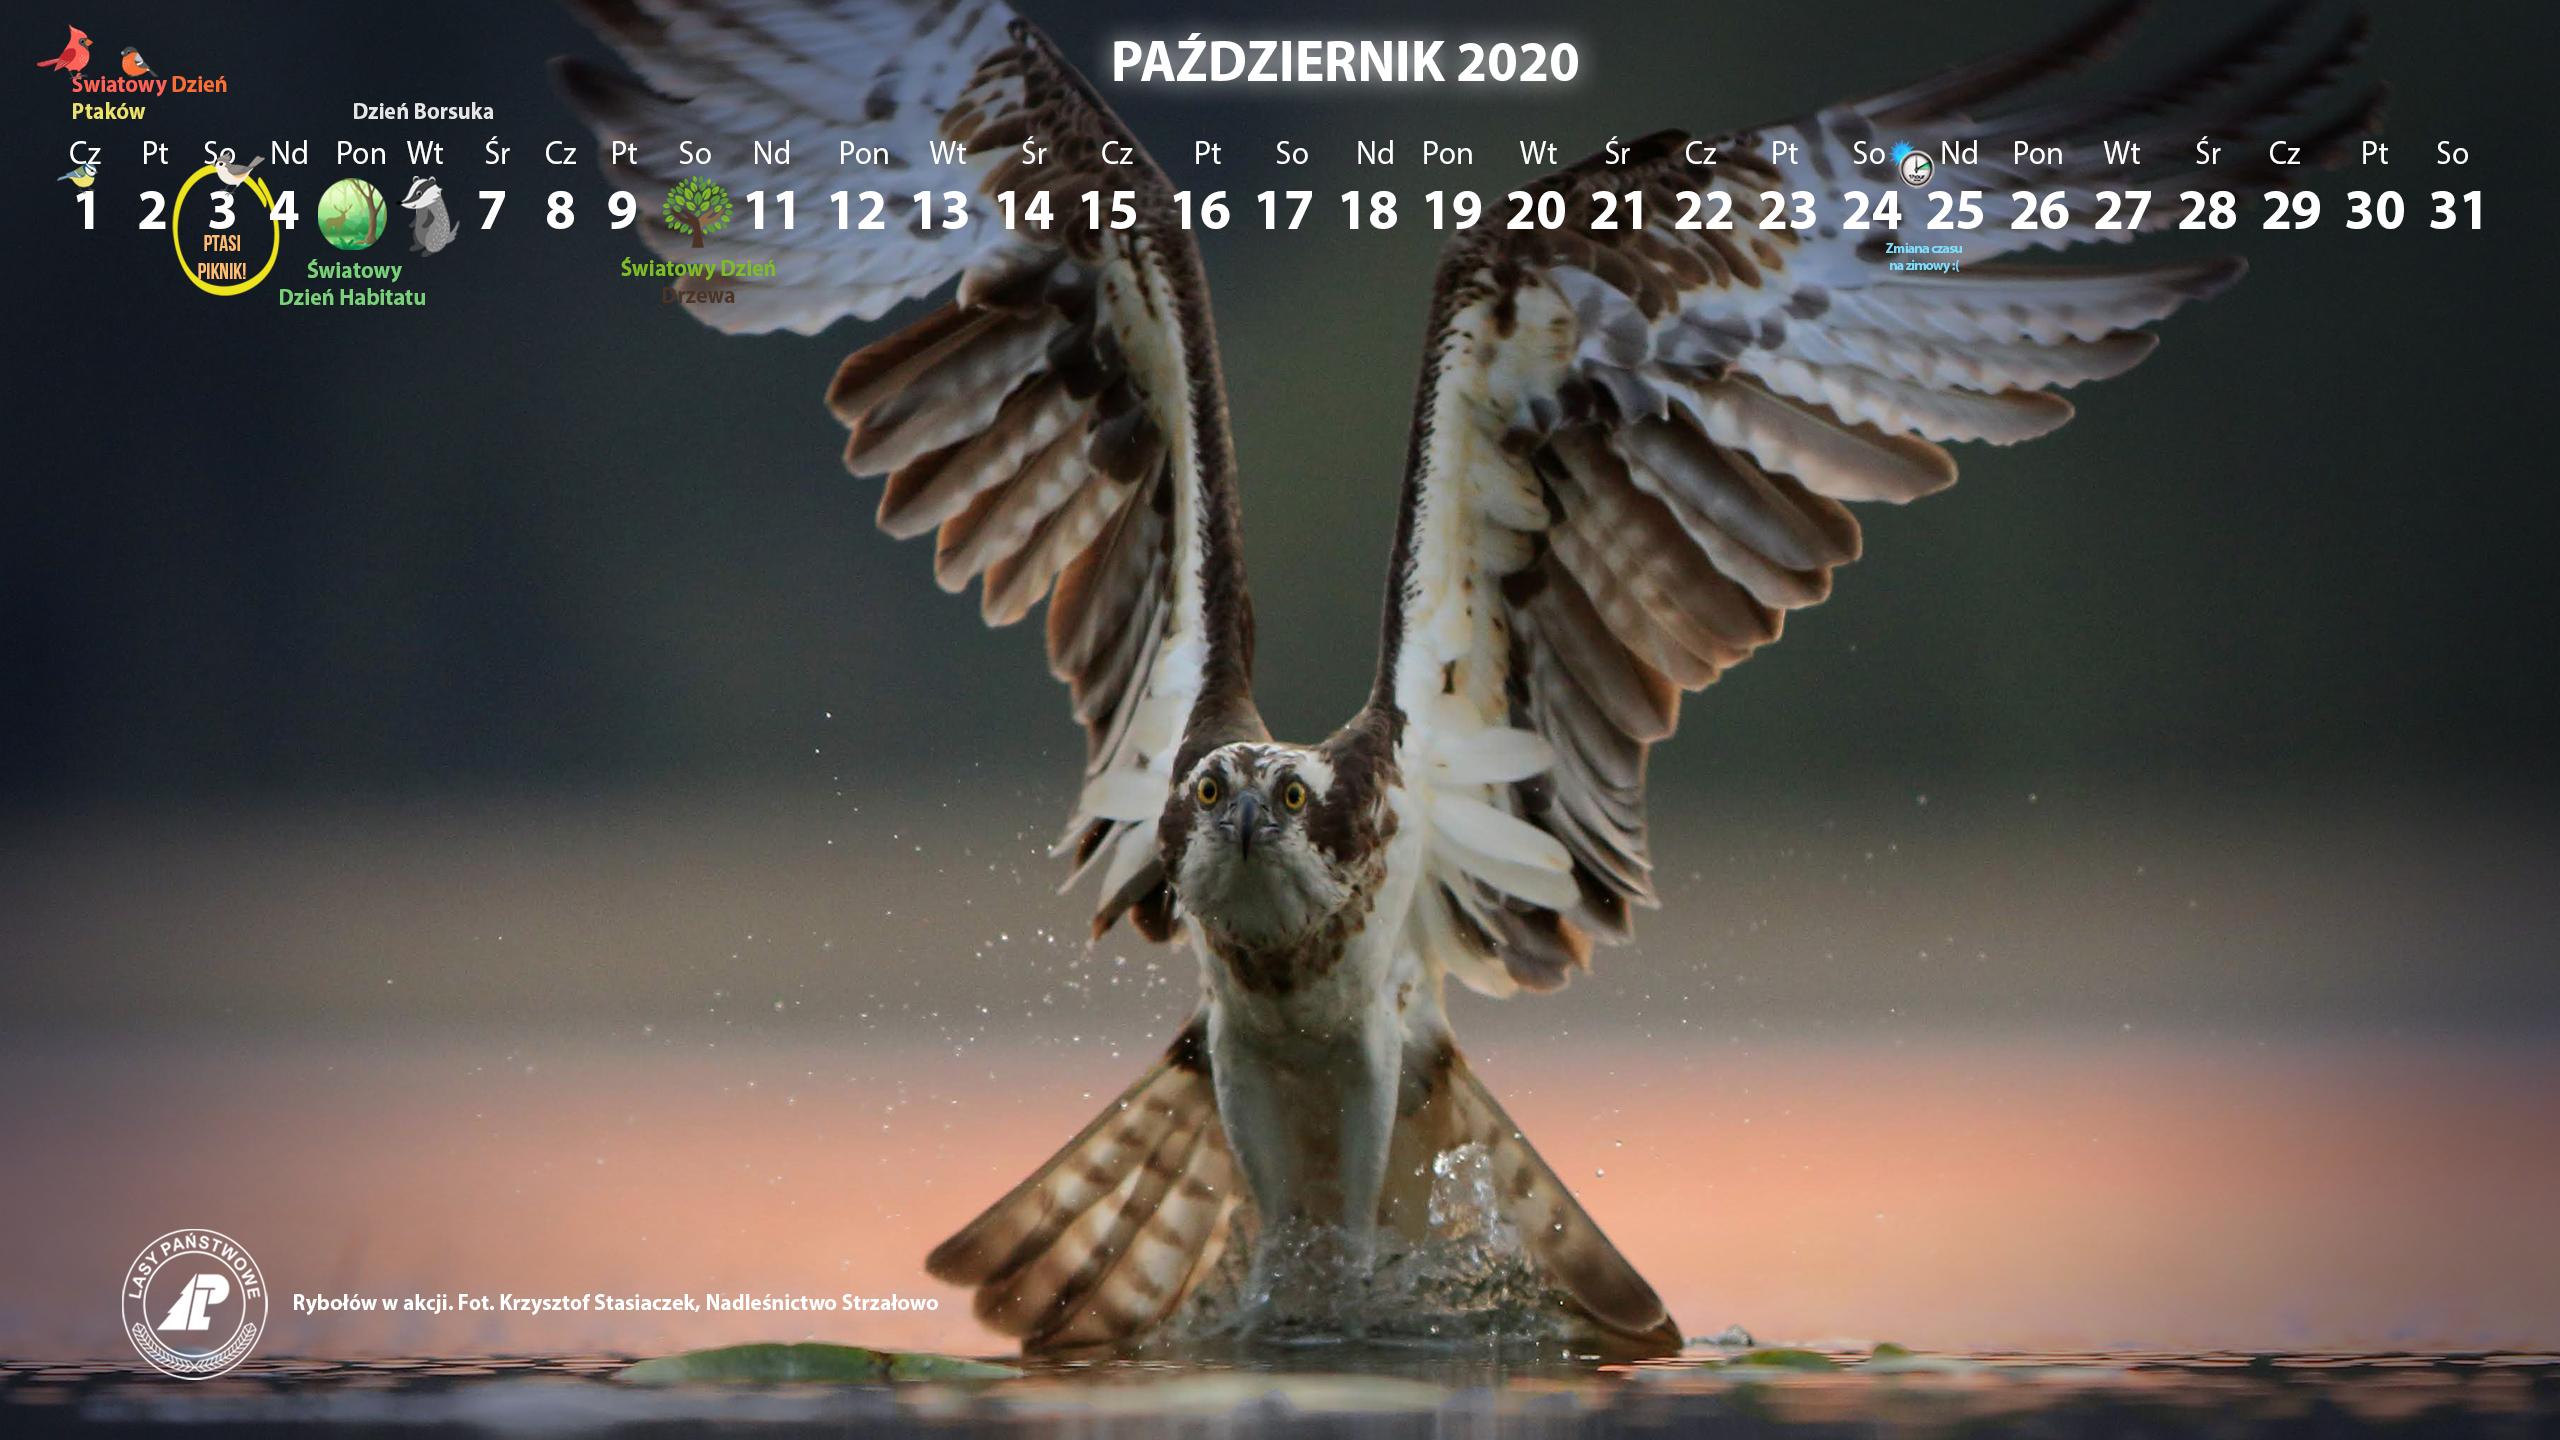 Kalendarz_2560X1440_PAŹDZIERNIK_2020[1].jpg